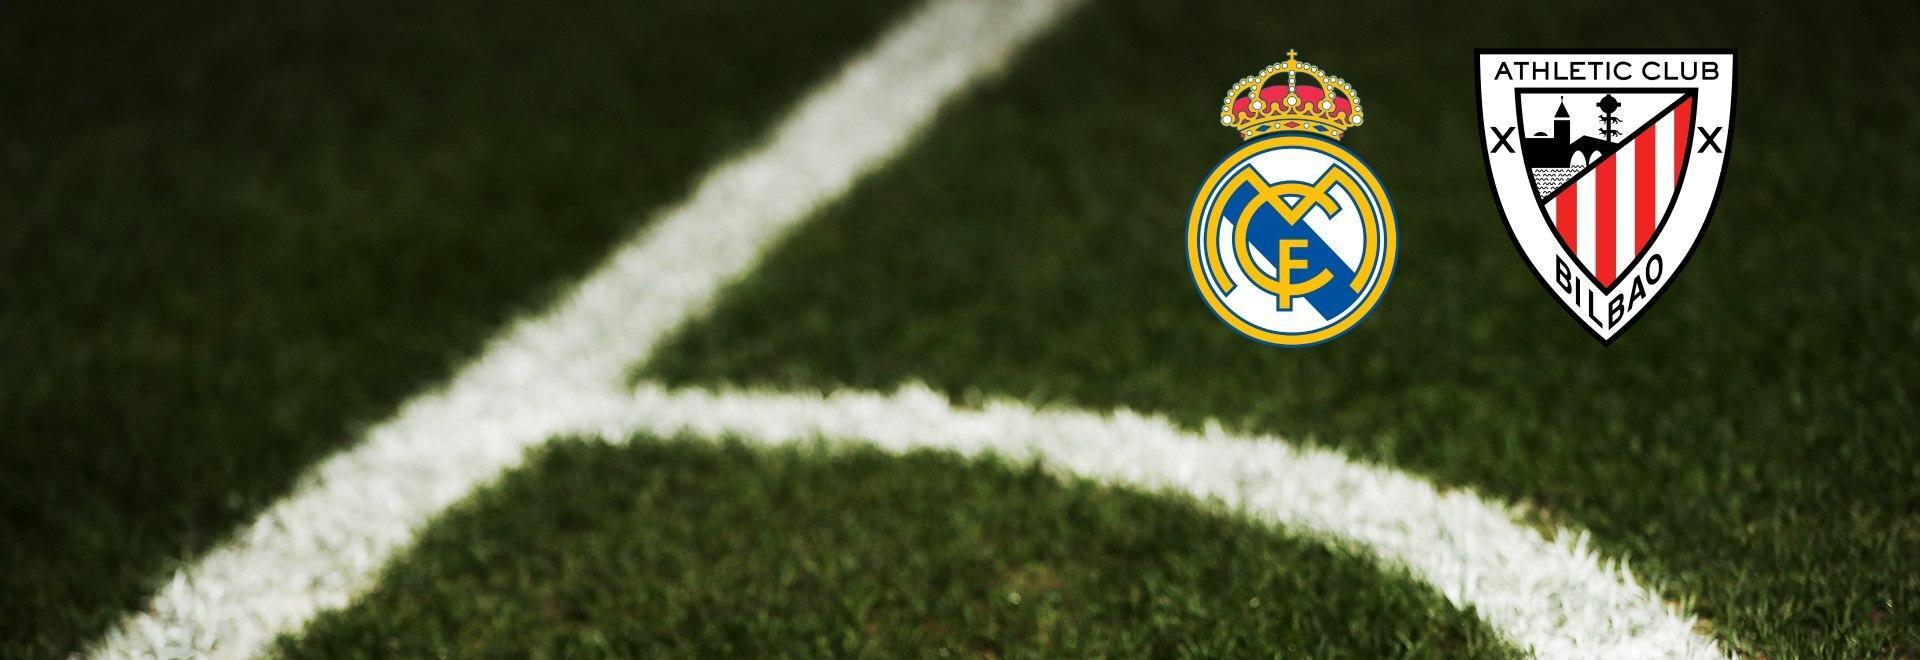 Real Madrid - Athletic Club. 19a g.